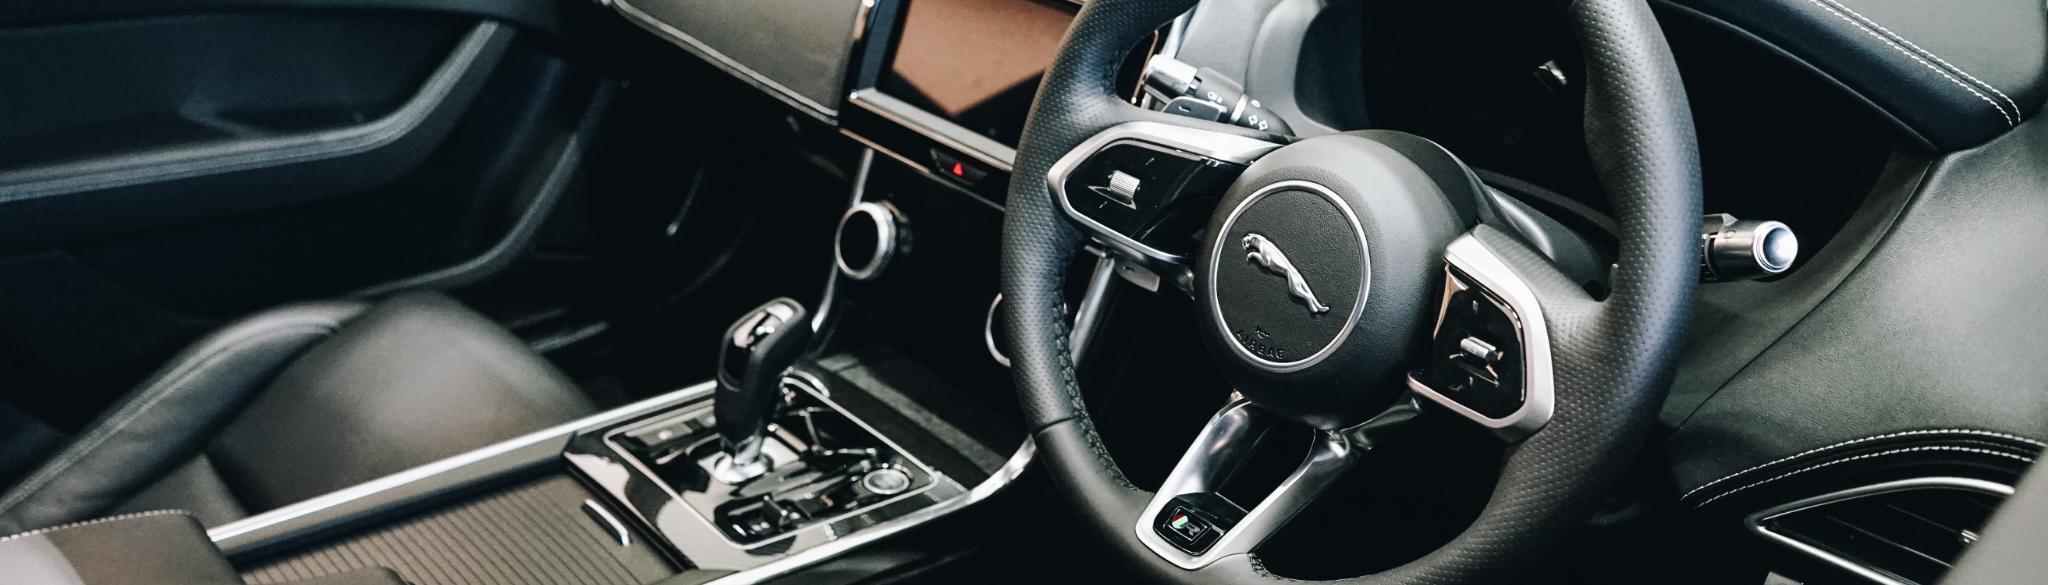 Jaguar XE Interior Cockpit